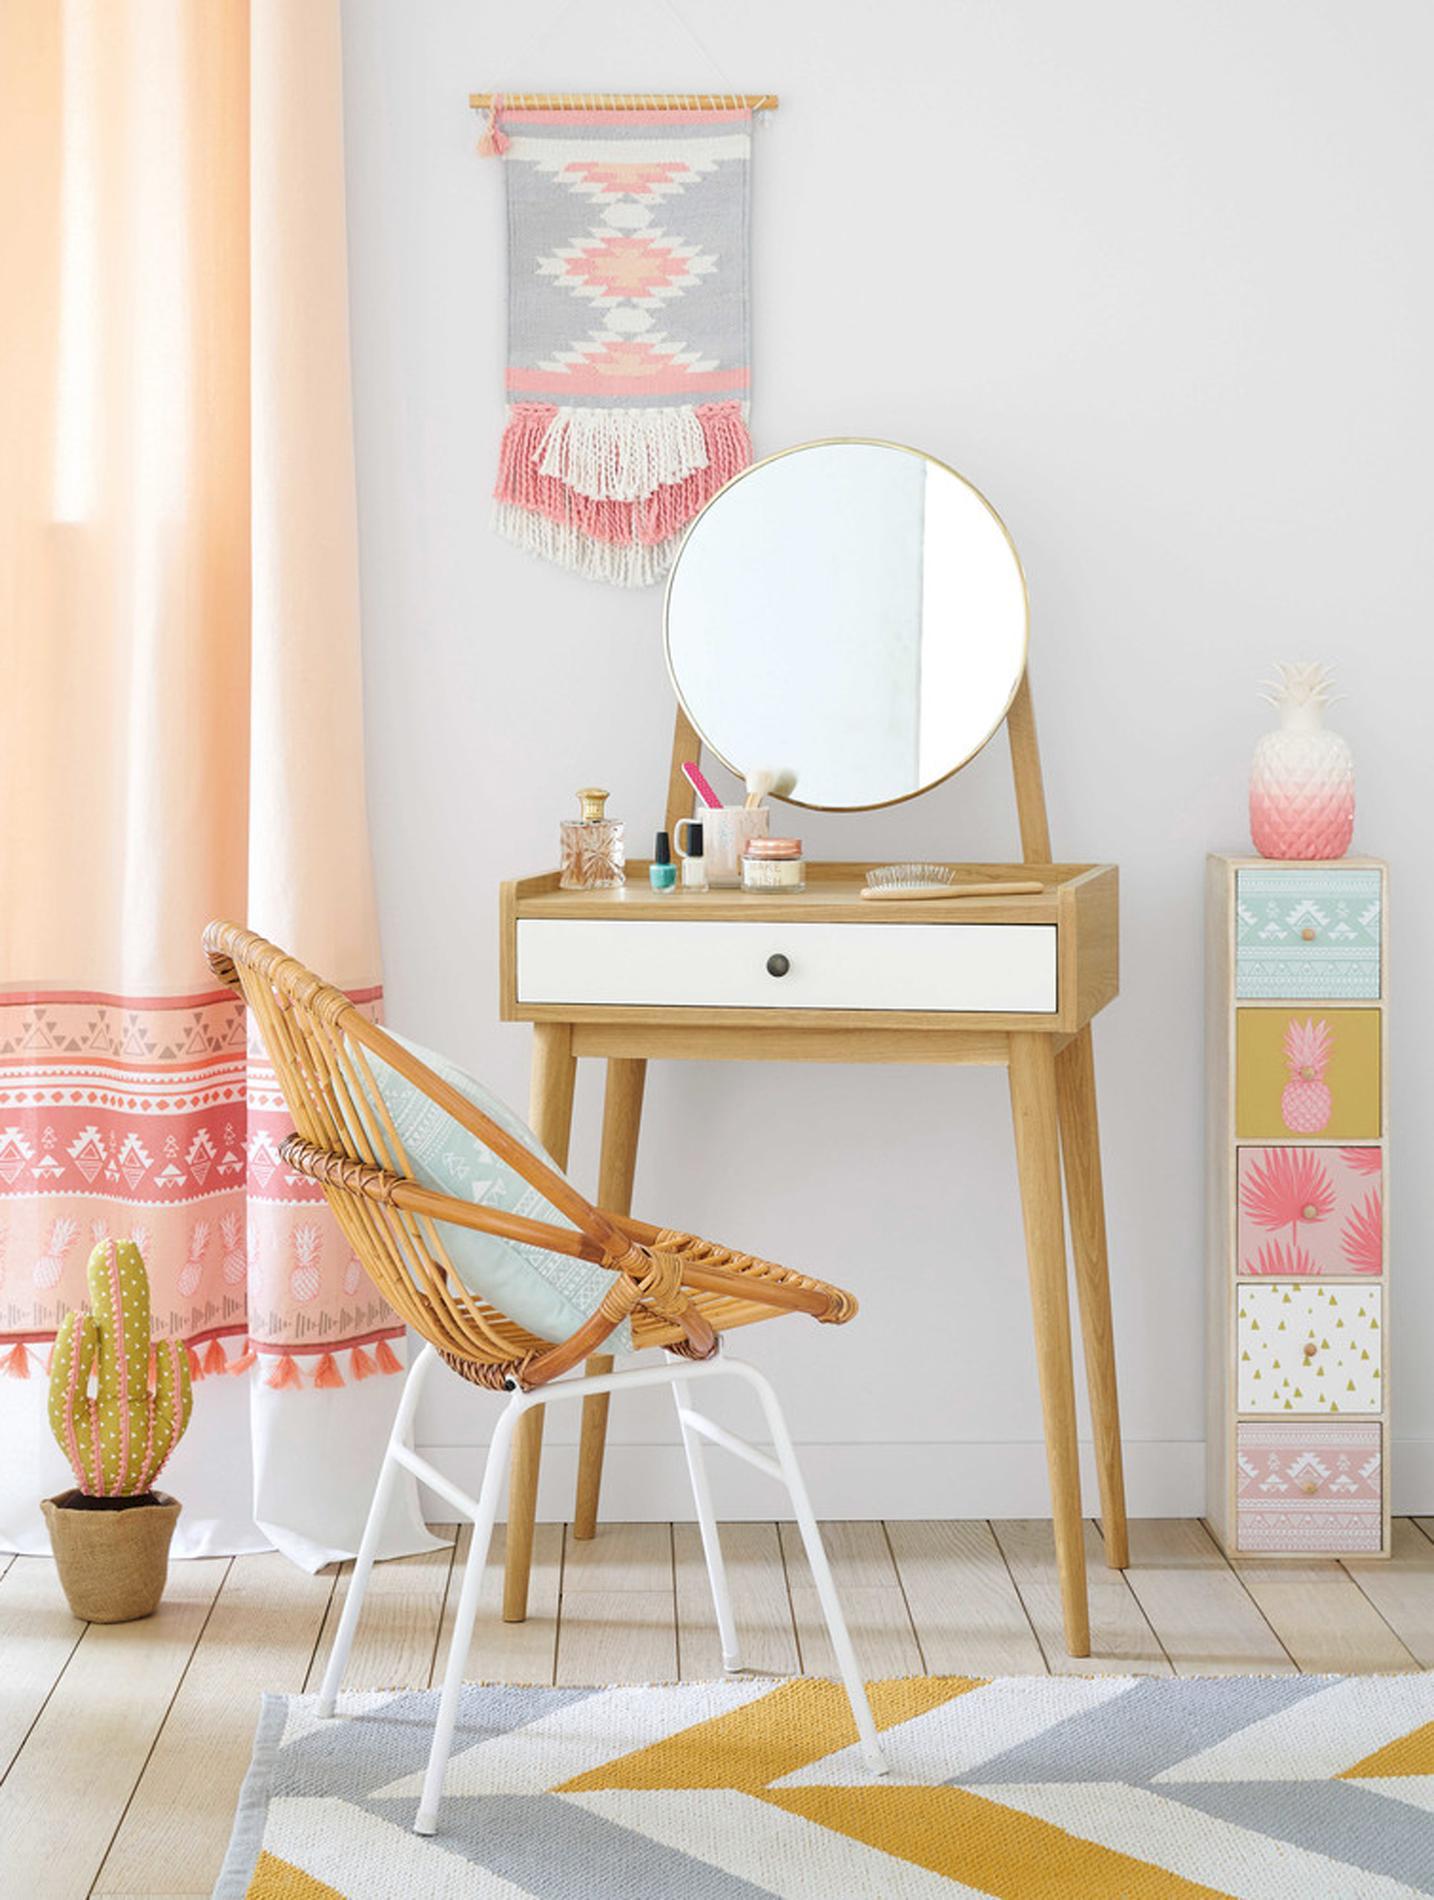 cool beautiful vingt objets dco pour transformer sa chambre en cocon douillet with deco chambre. Black Bedroom Furniture Sets. Home Design Ideas